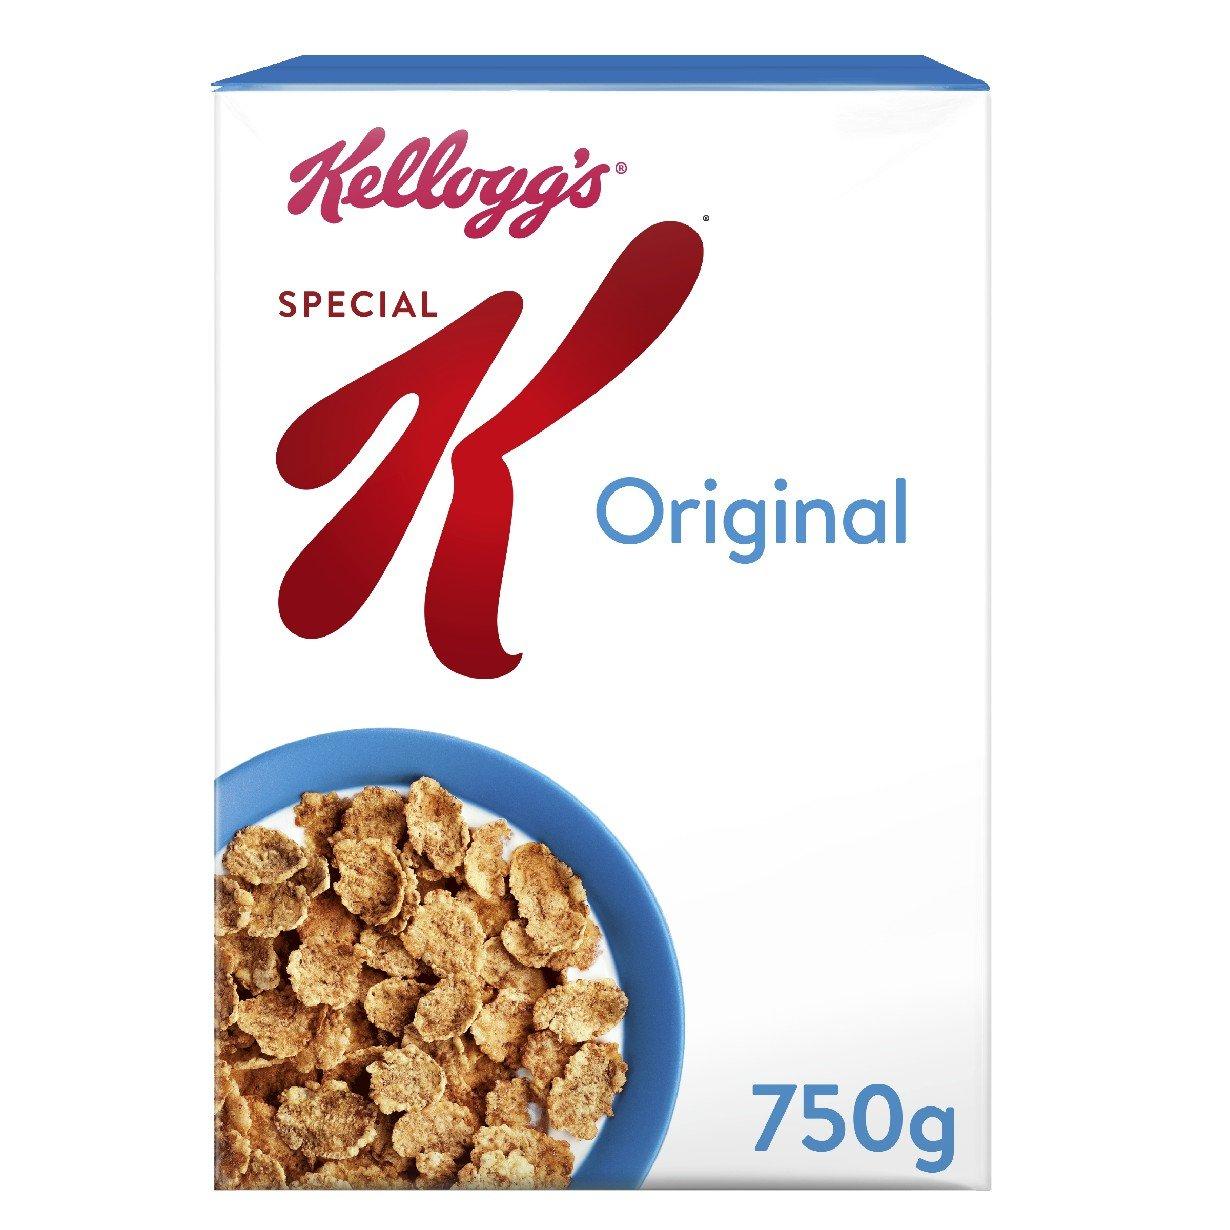 Kellogg's special k 750g £1.80 (£15 minimum spend +£3.99 del) @ Amazon prime now